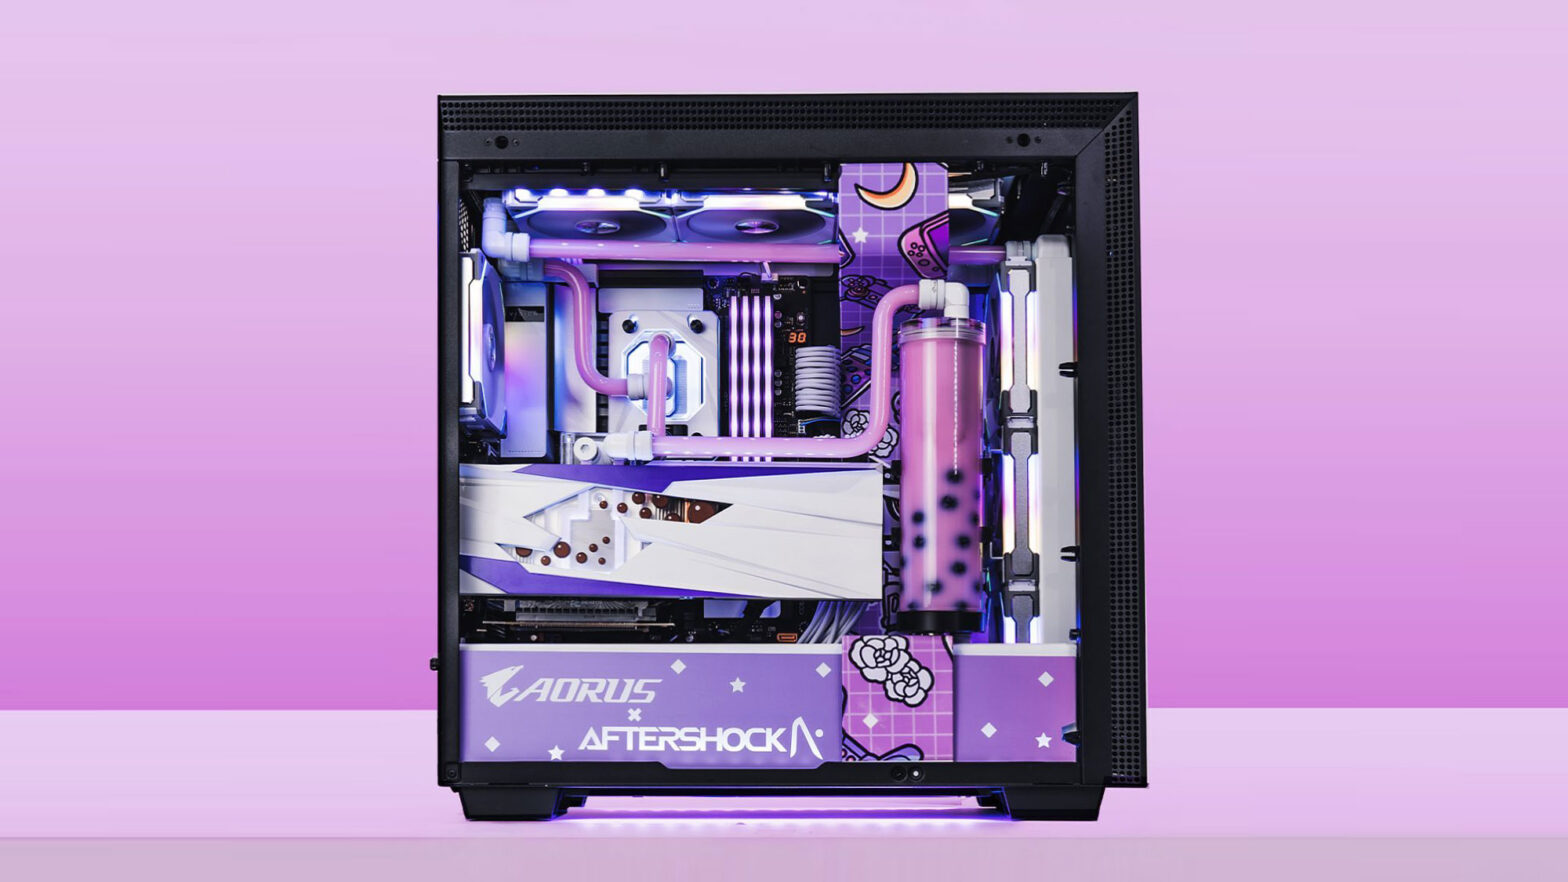 AORUS x Aftershock Bubble Tea-themed PC